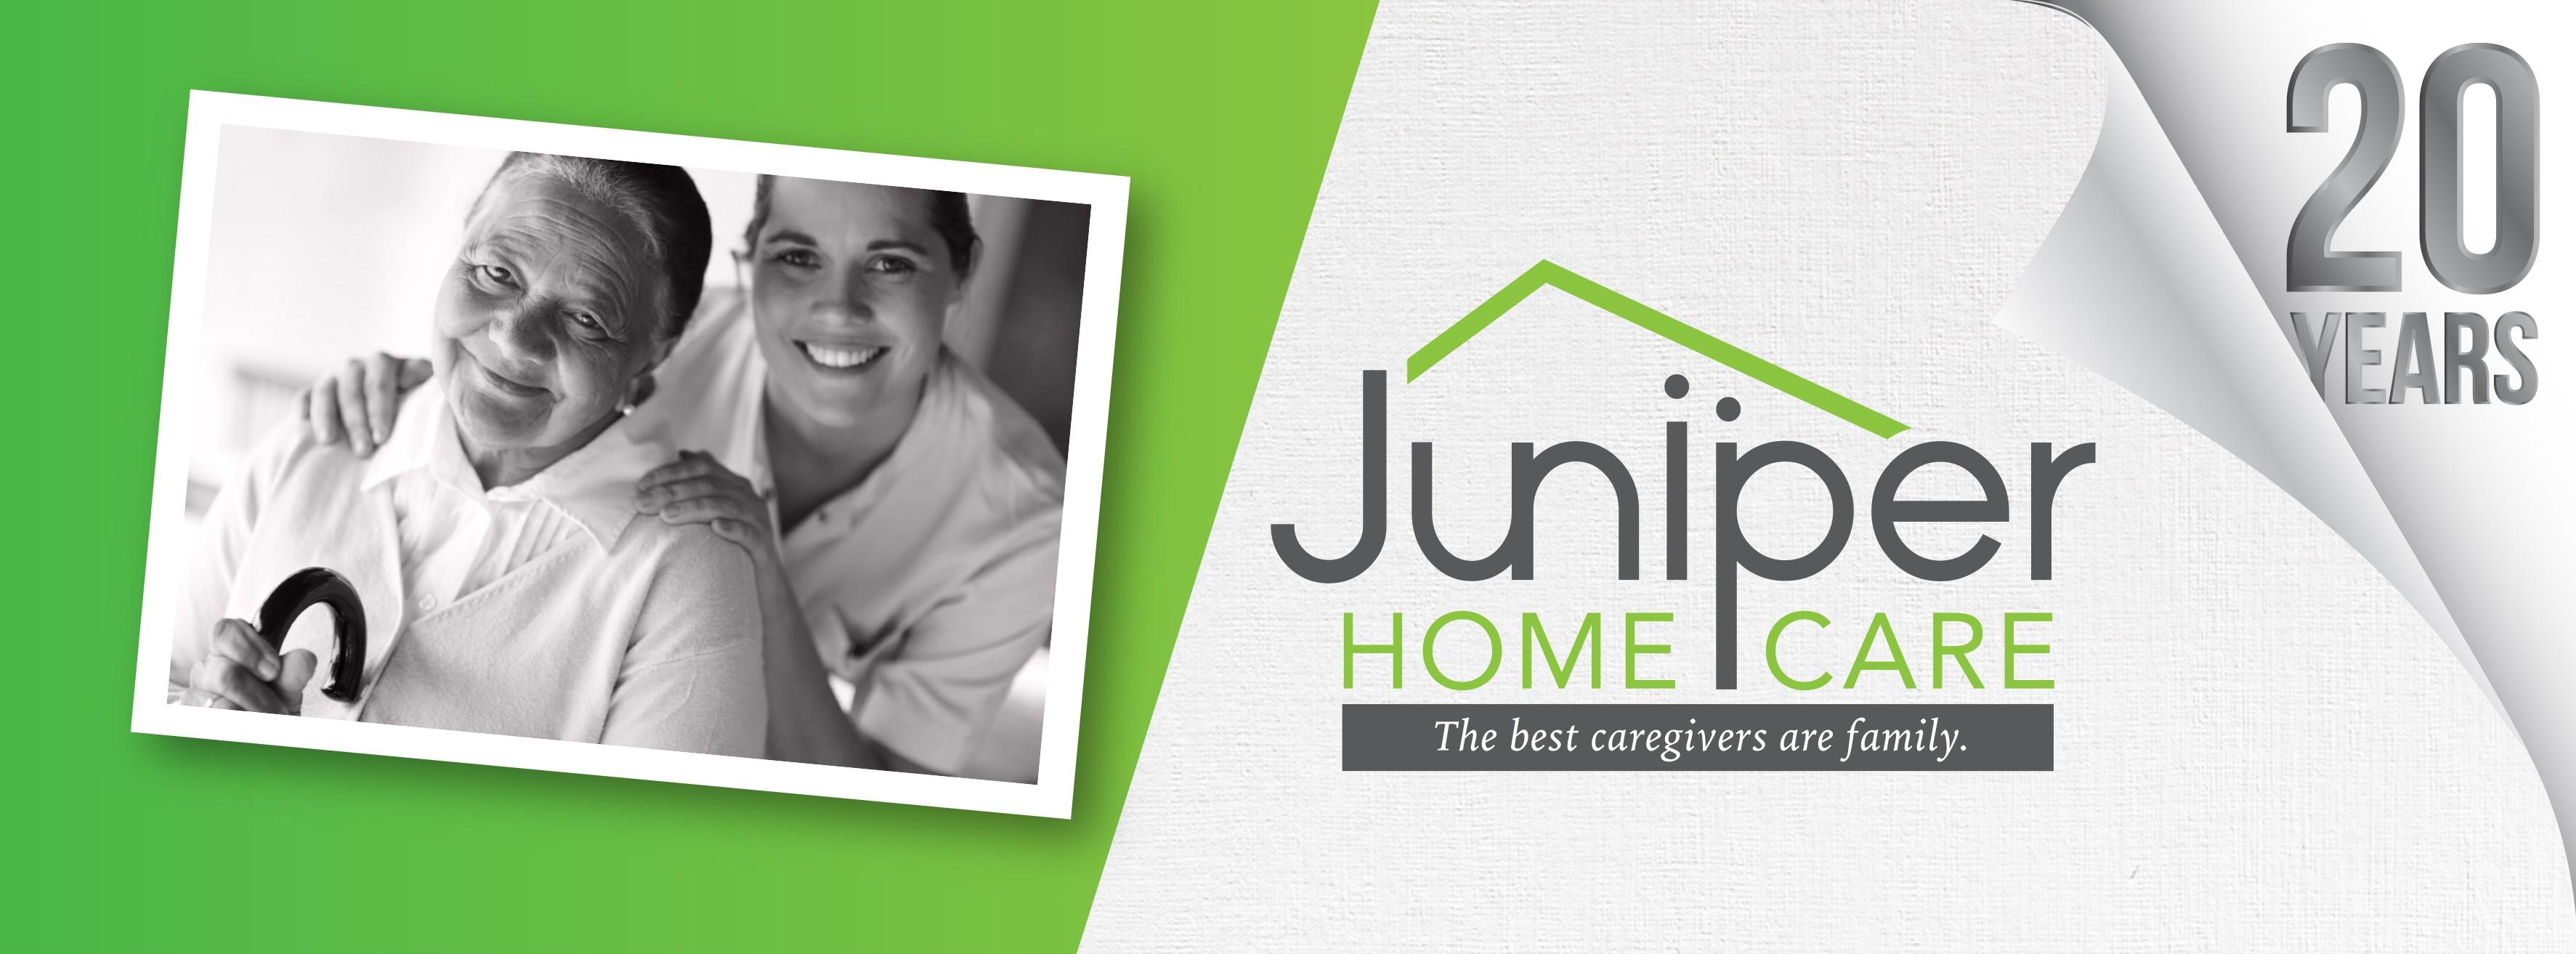 Juniper Homecare | LinkedIn